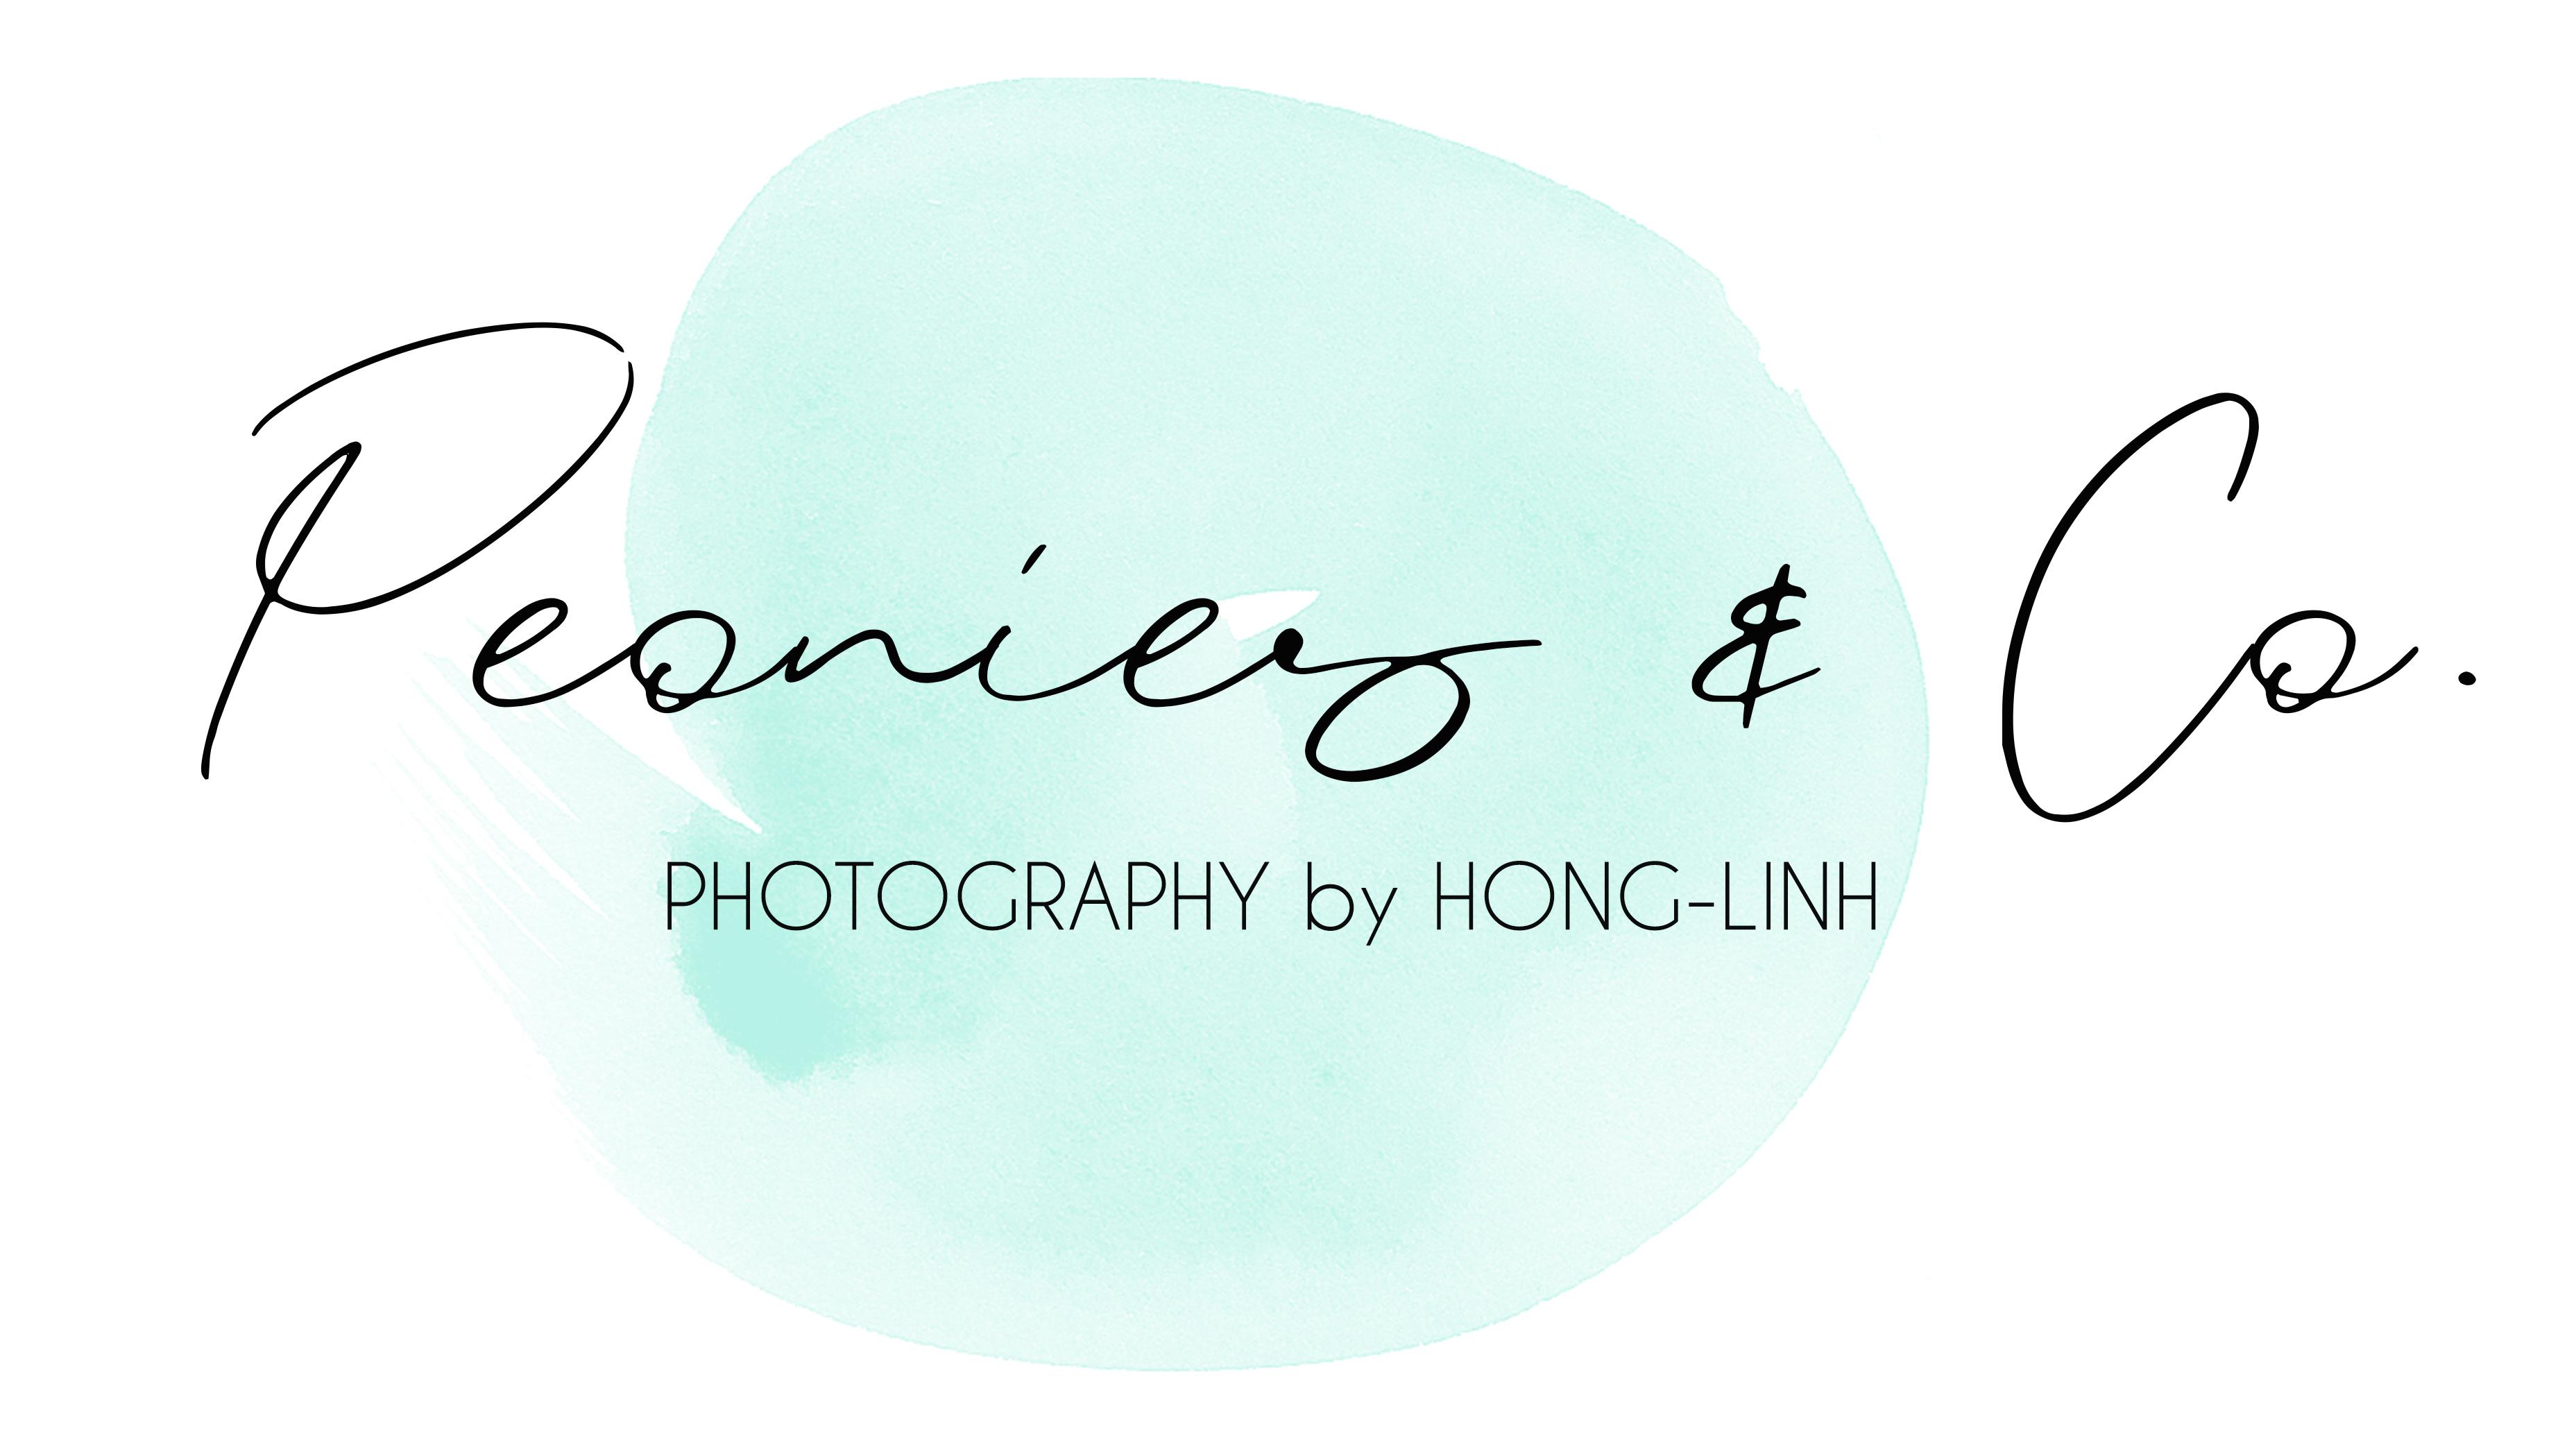 Peonies & Co - London Photographer